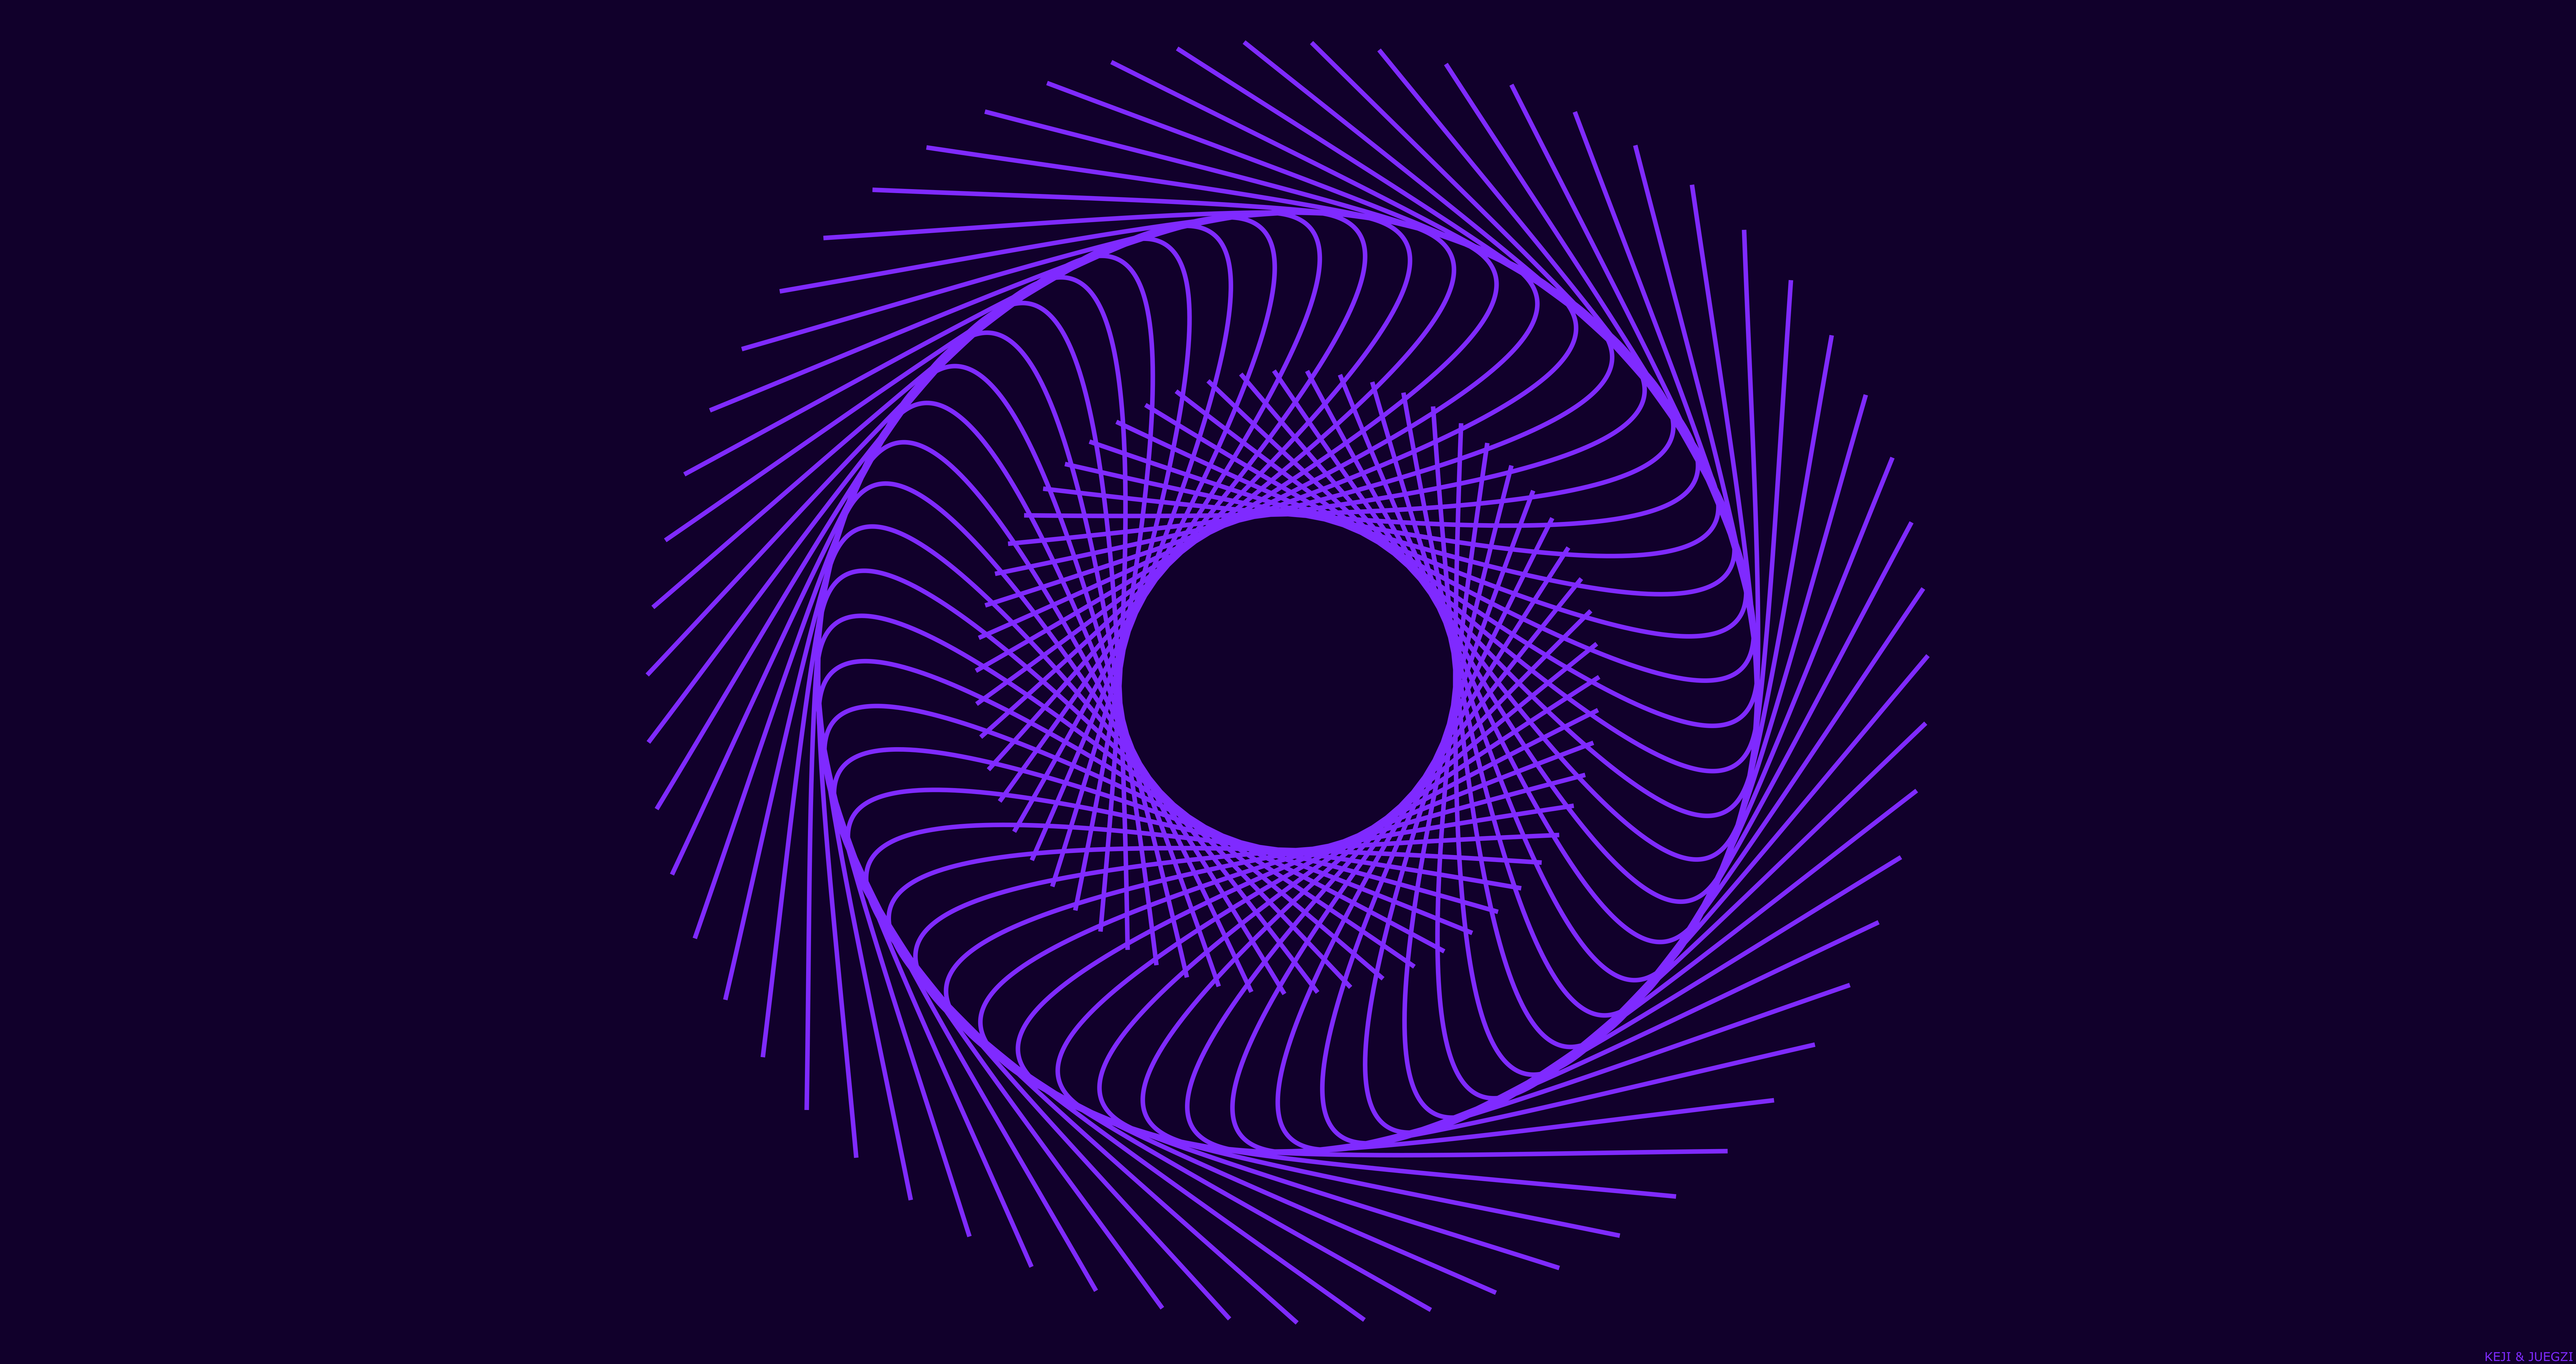 Violet 8k Ultra Fond d'écran HD | Arrière-Plan | 8500x4500 | ID:1012801 - Wallpaper Abyss